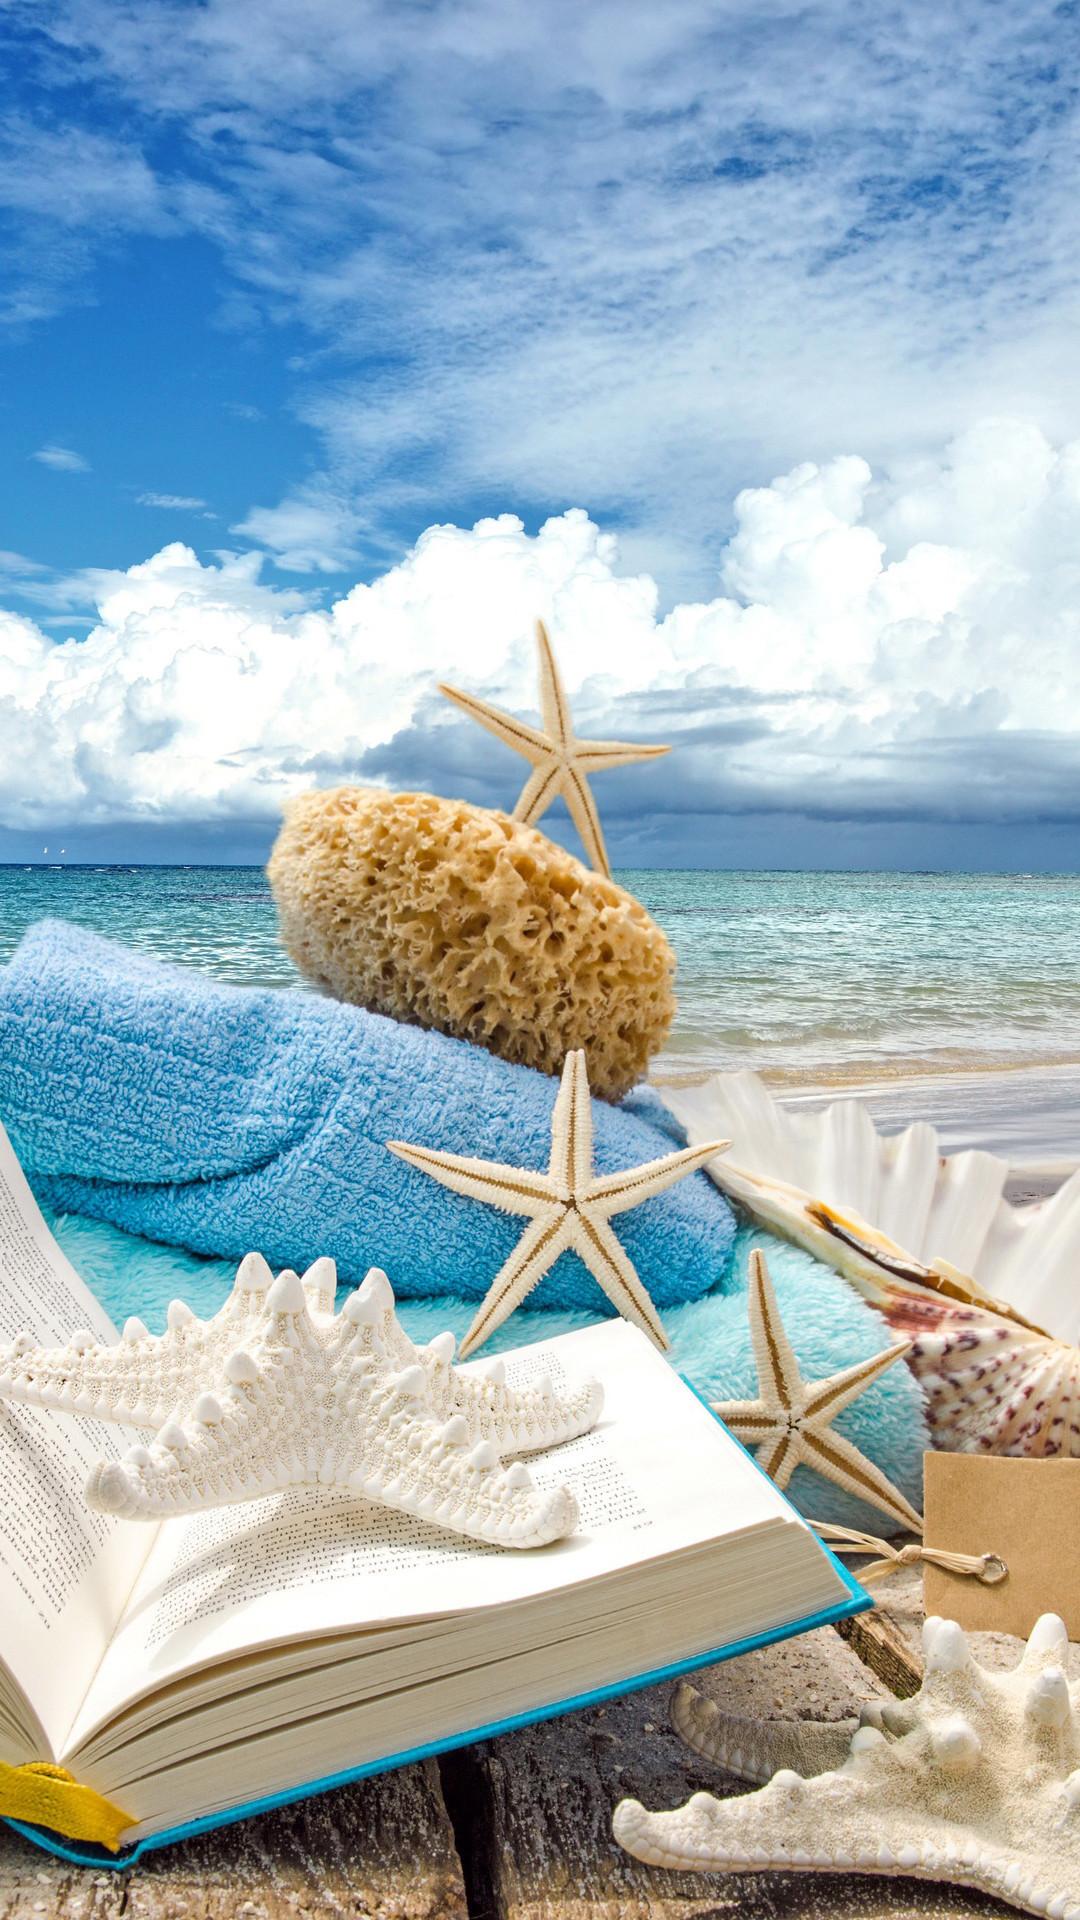 Summer Beach Book Seashells Sea Stars iPhone 6 Plus HD Wallpaper